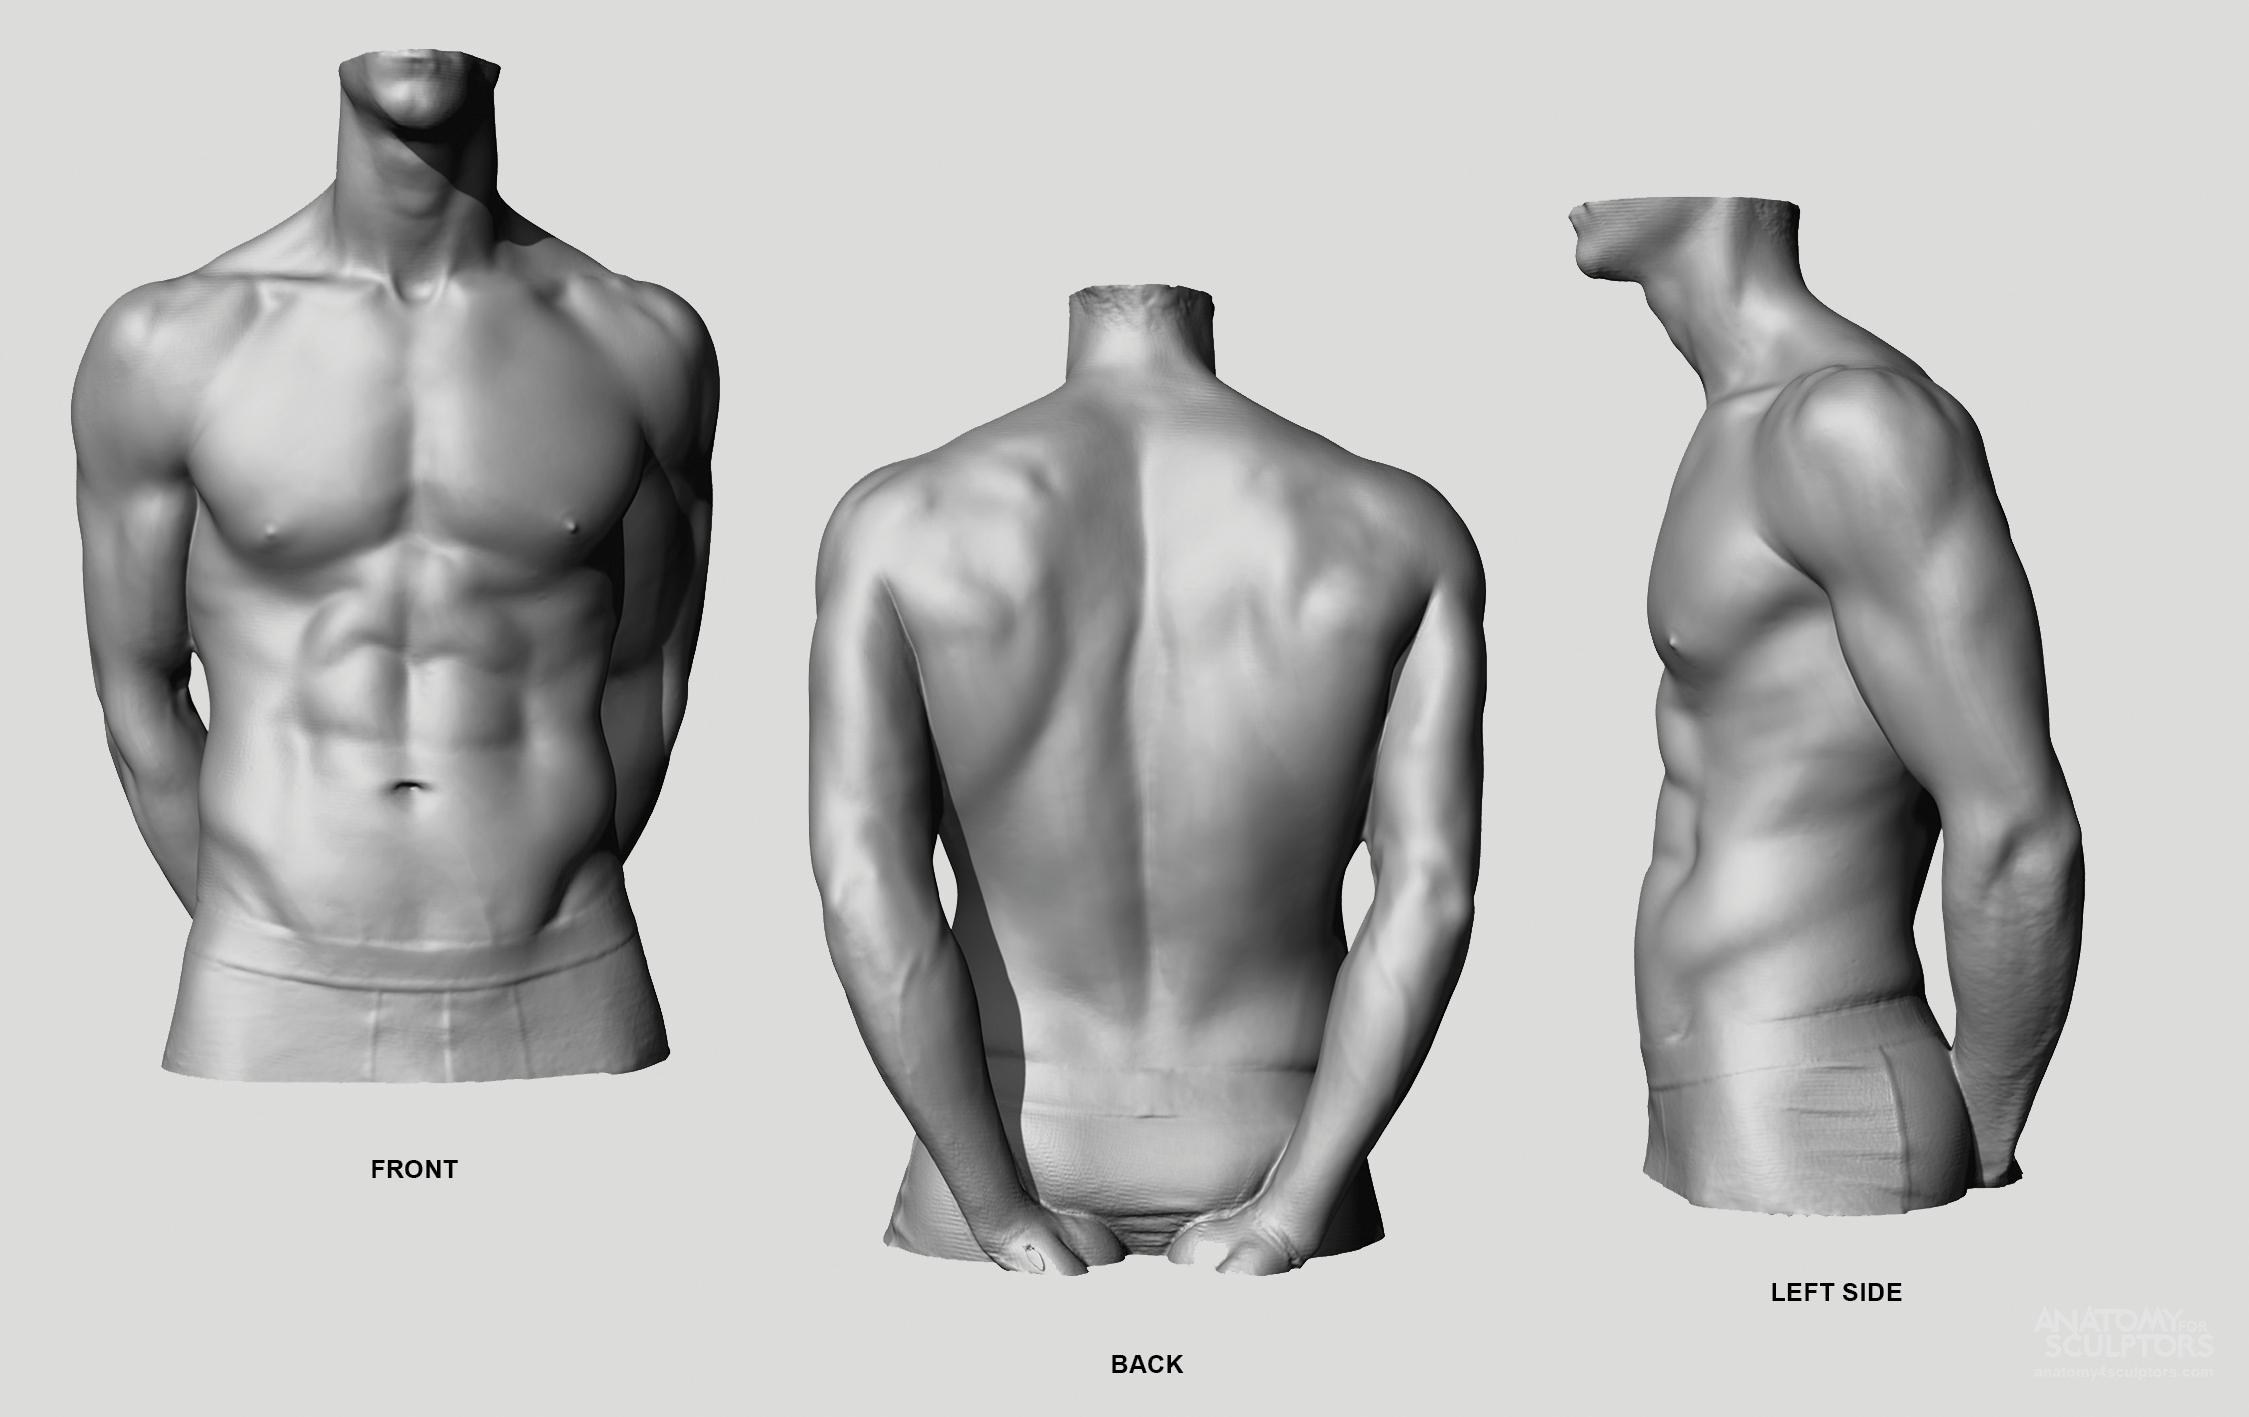 Pin By Art Guy On Anatomy Pinterest Anatomy Anatomy Reference